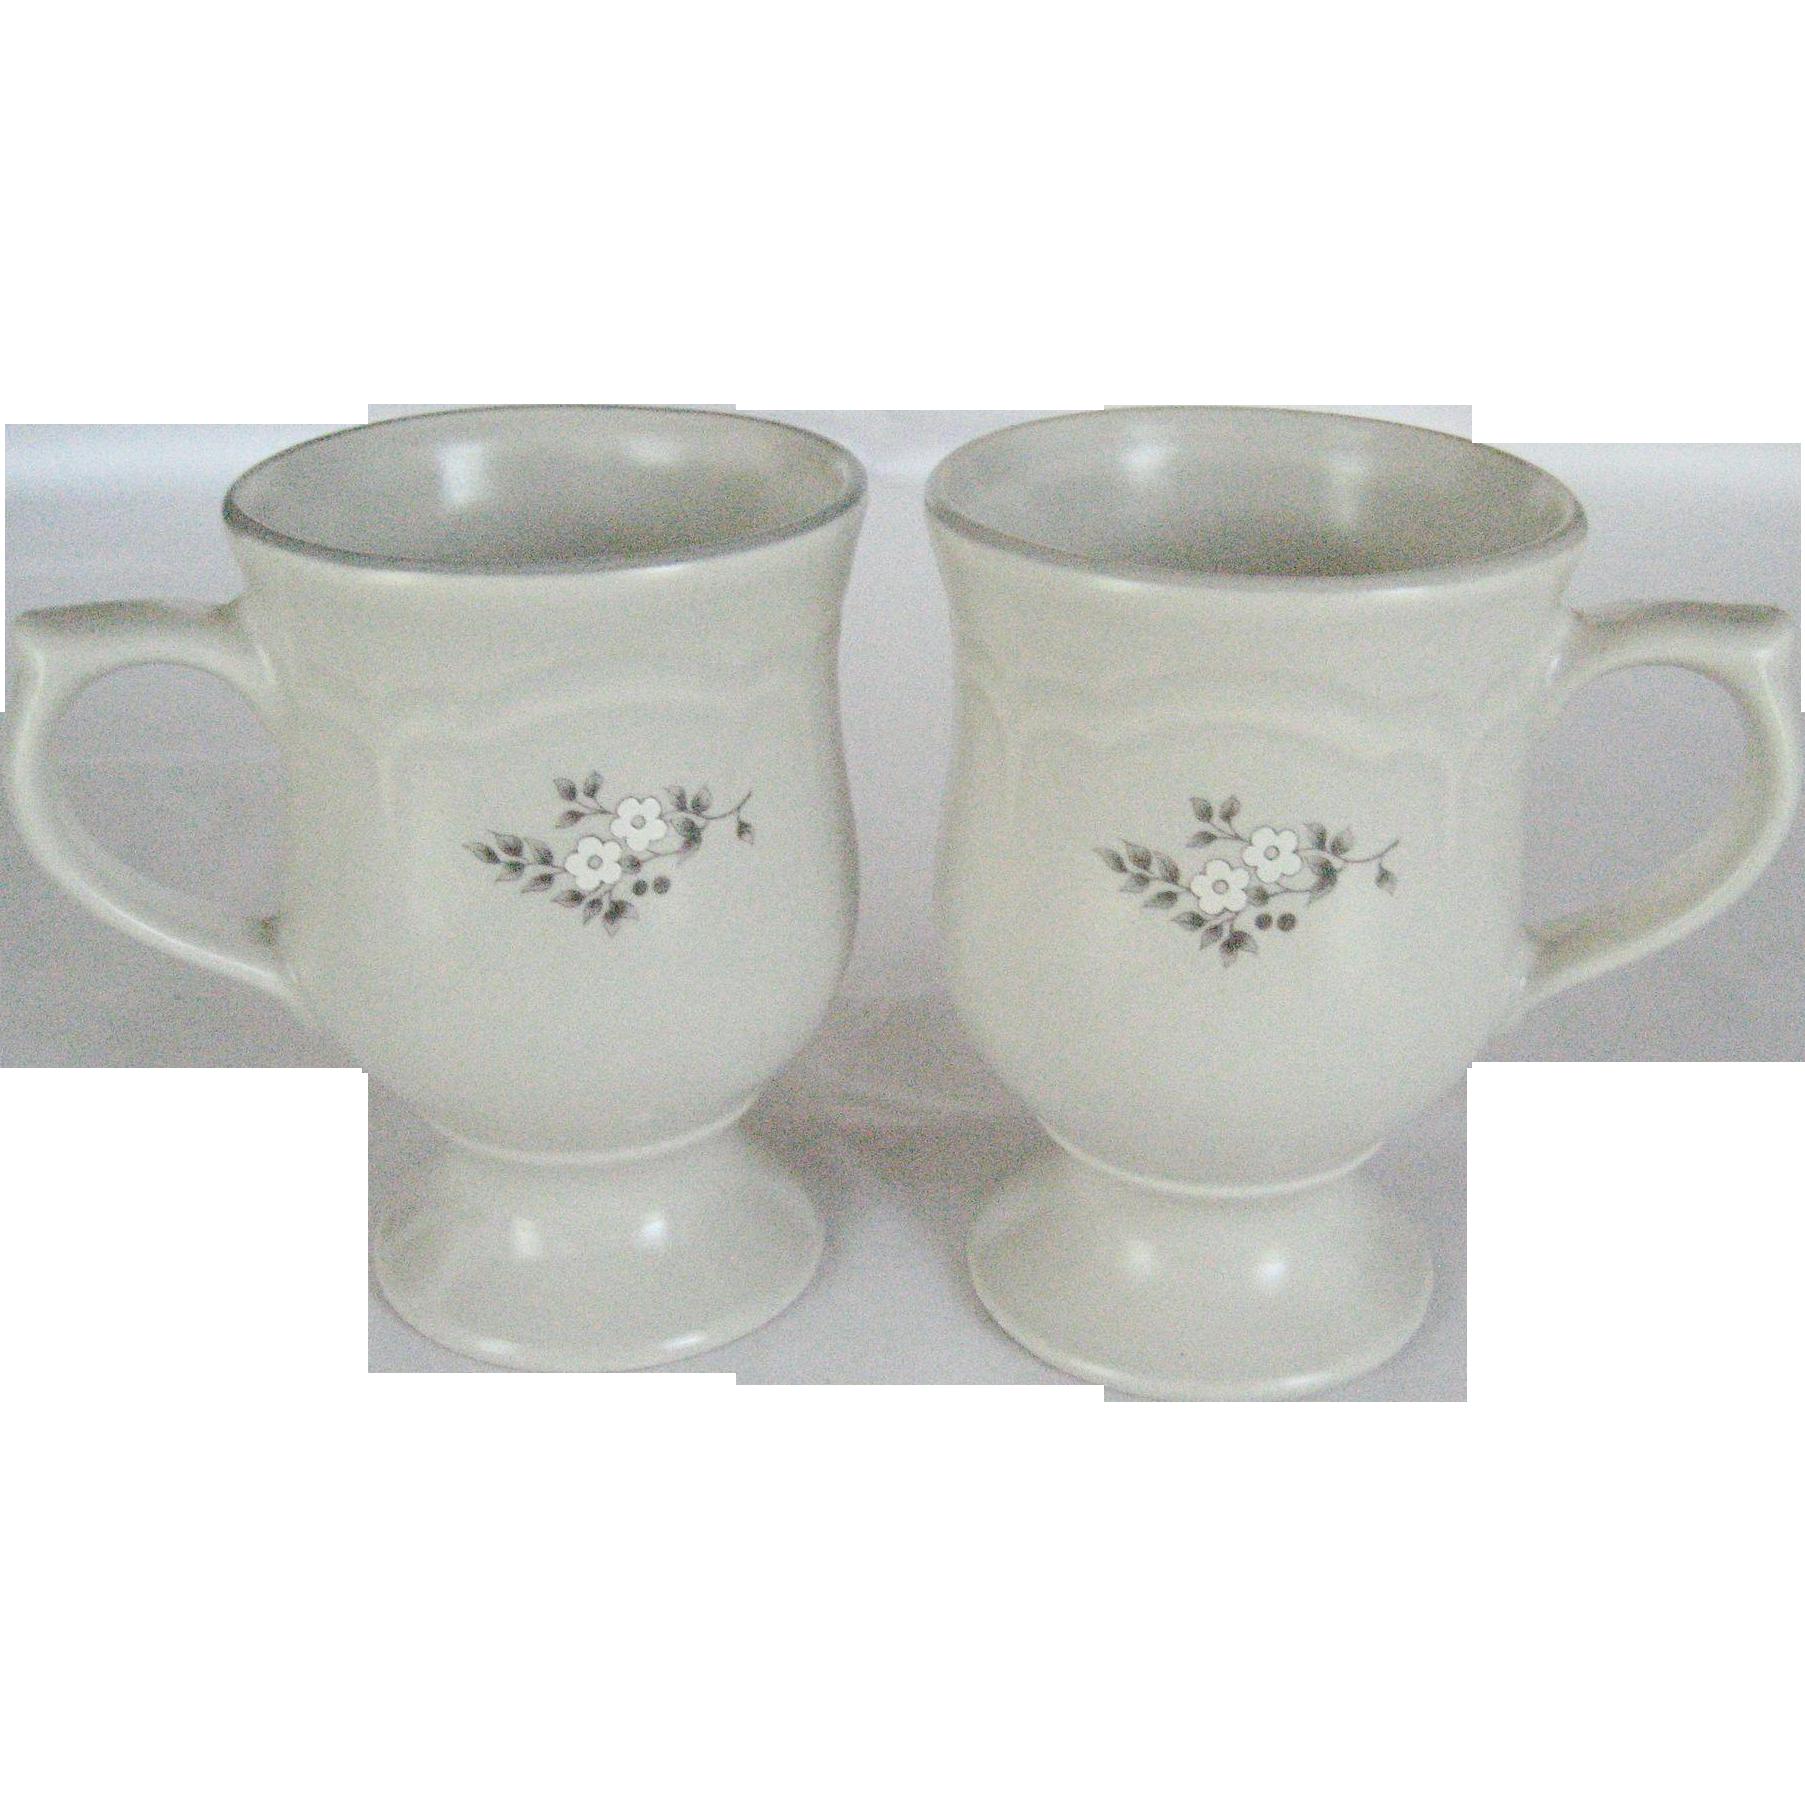 "Pair of Pfaltzgraff ""Heirloom"" Pedestal Mugs"